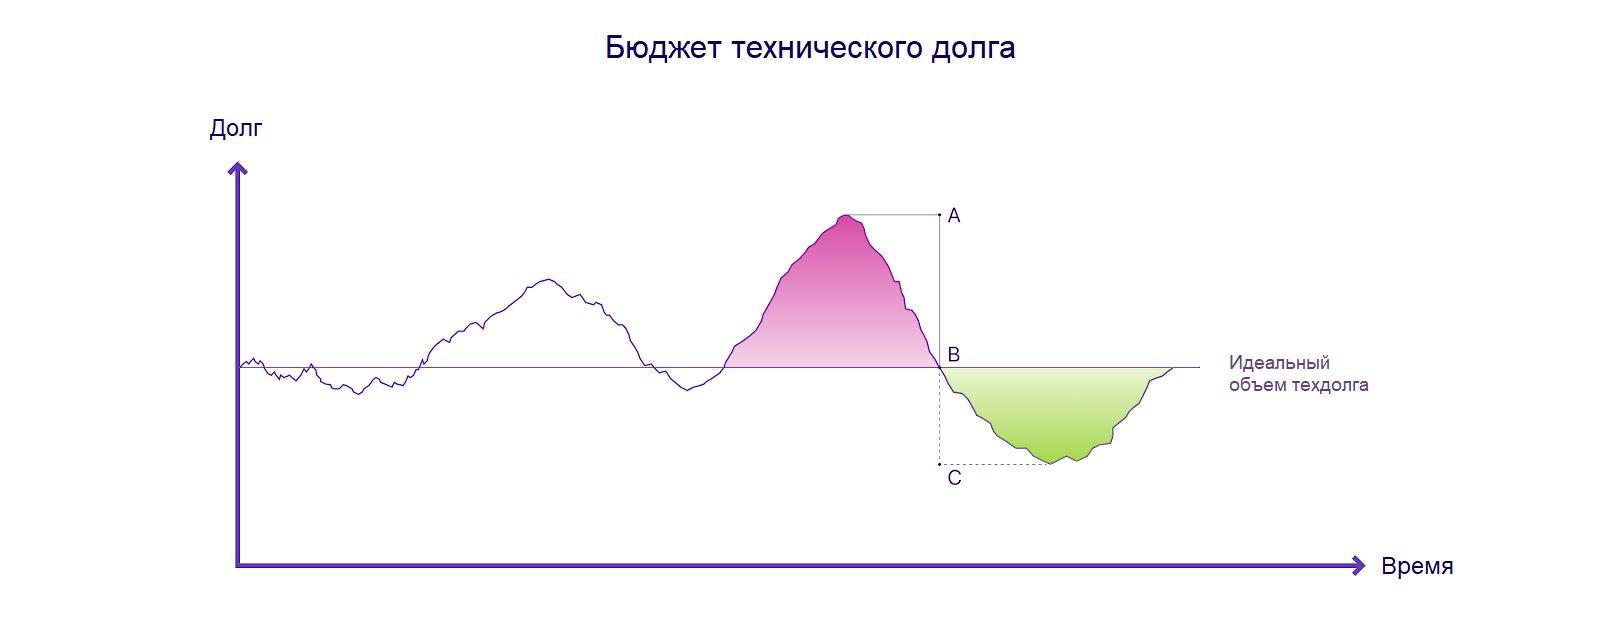 кредит 24 money banki ru